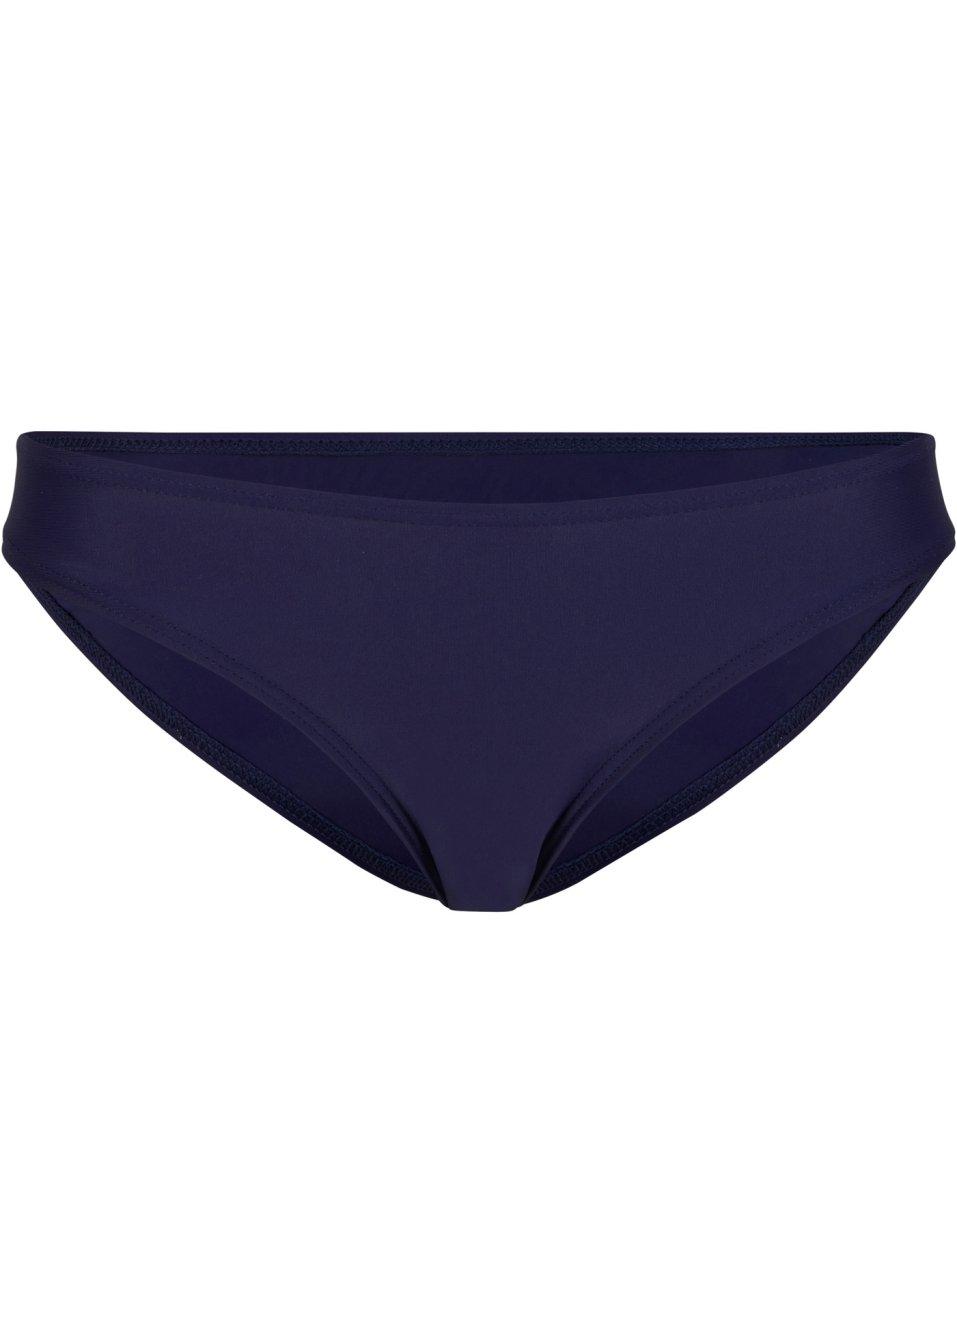 Tolle Bikinihose mit modischem Druck - dunkelblau cr1YS gSqnU